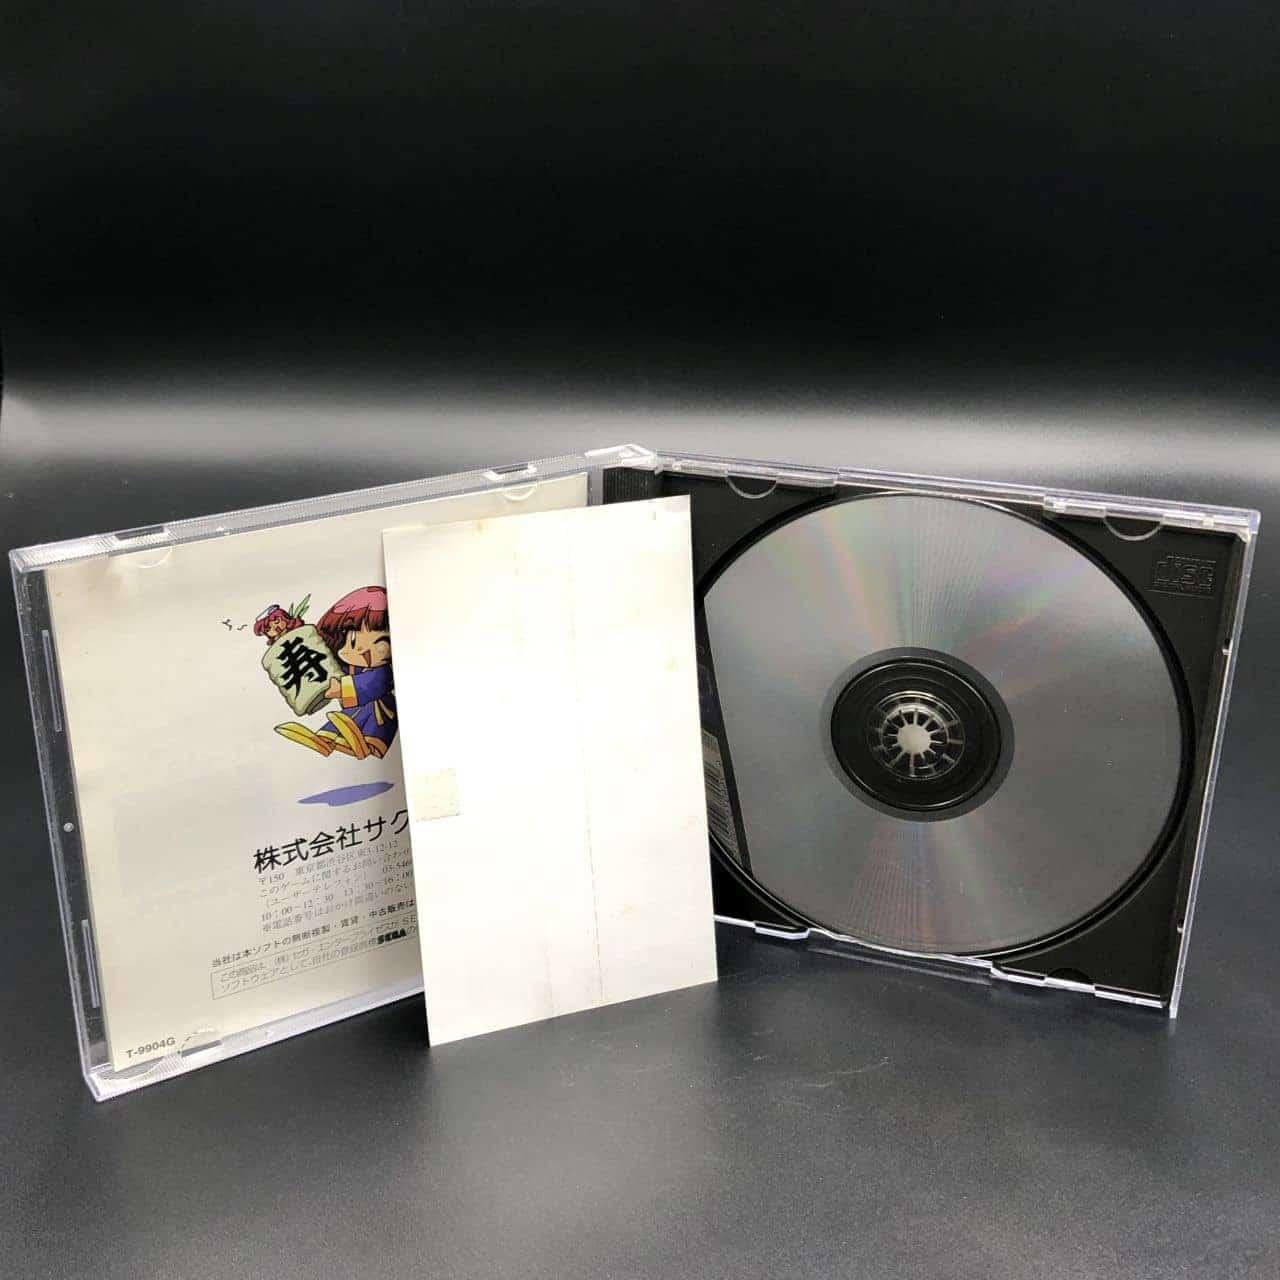 Cotton 2 - Magical Night Dreams (Import Japan) (mit Spine, ohne Reg. Card) (Sehr gut) Sega Saturn